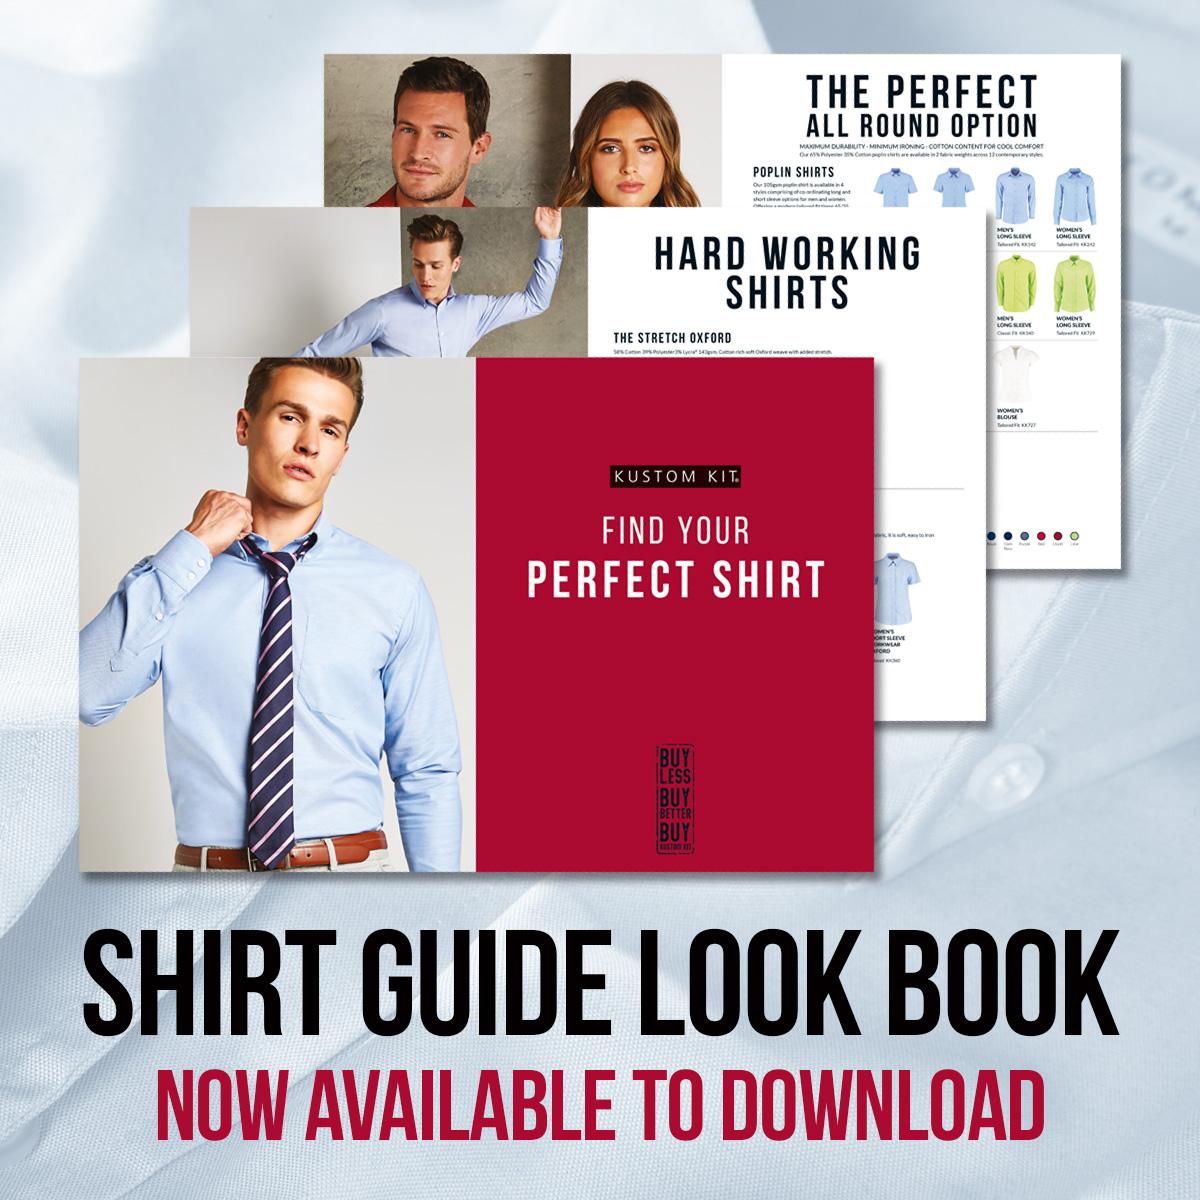 Shirt Guide Look Book